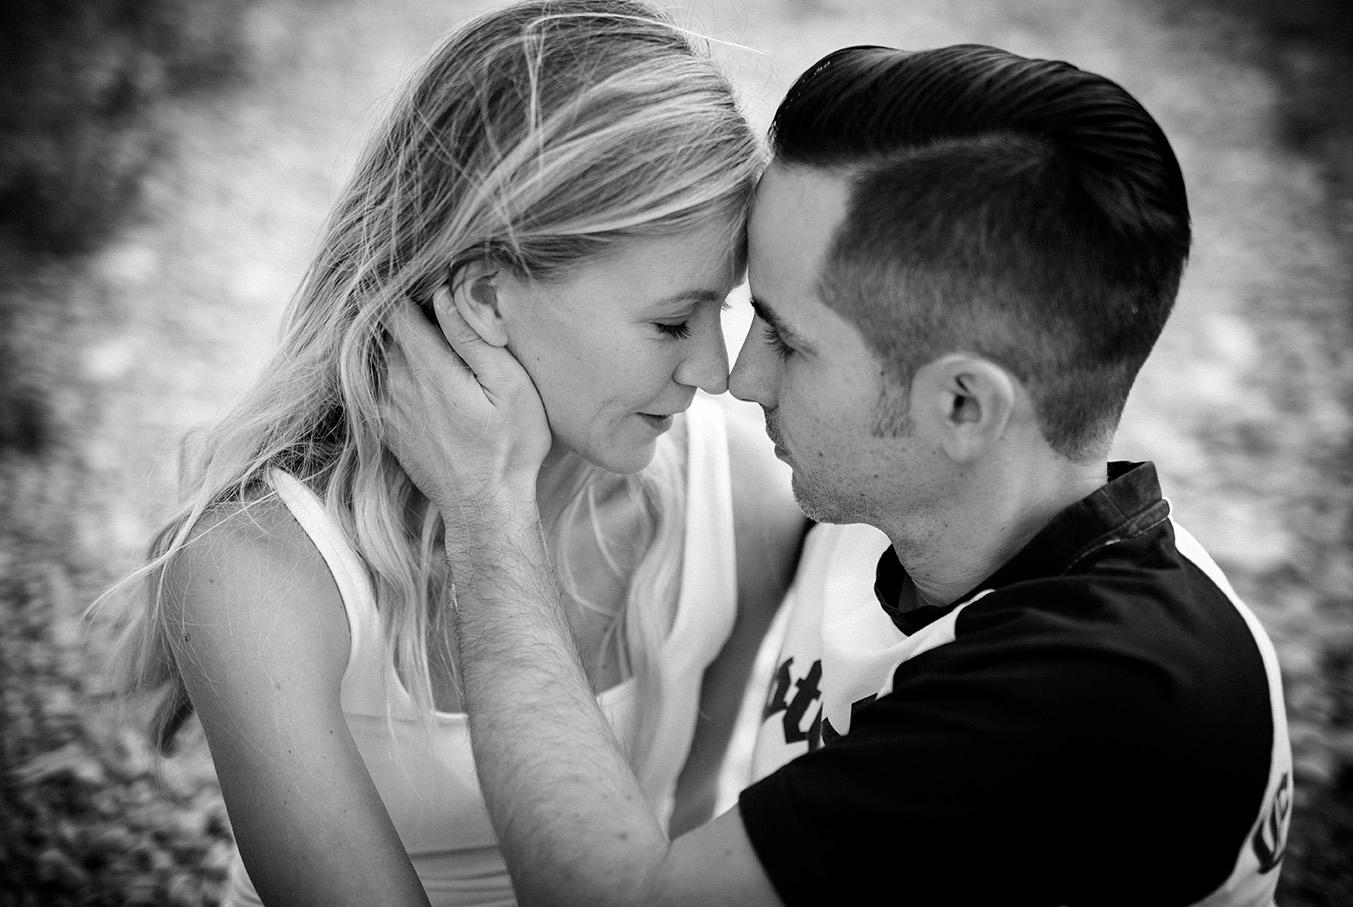 Vienna_Wien_Couple_Hochzeit_Paar_Verlobung_Engagement_Shooting_13